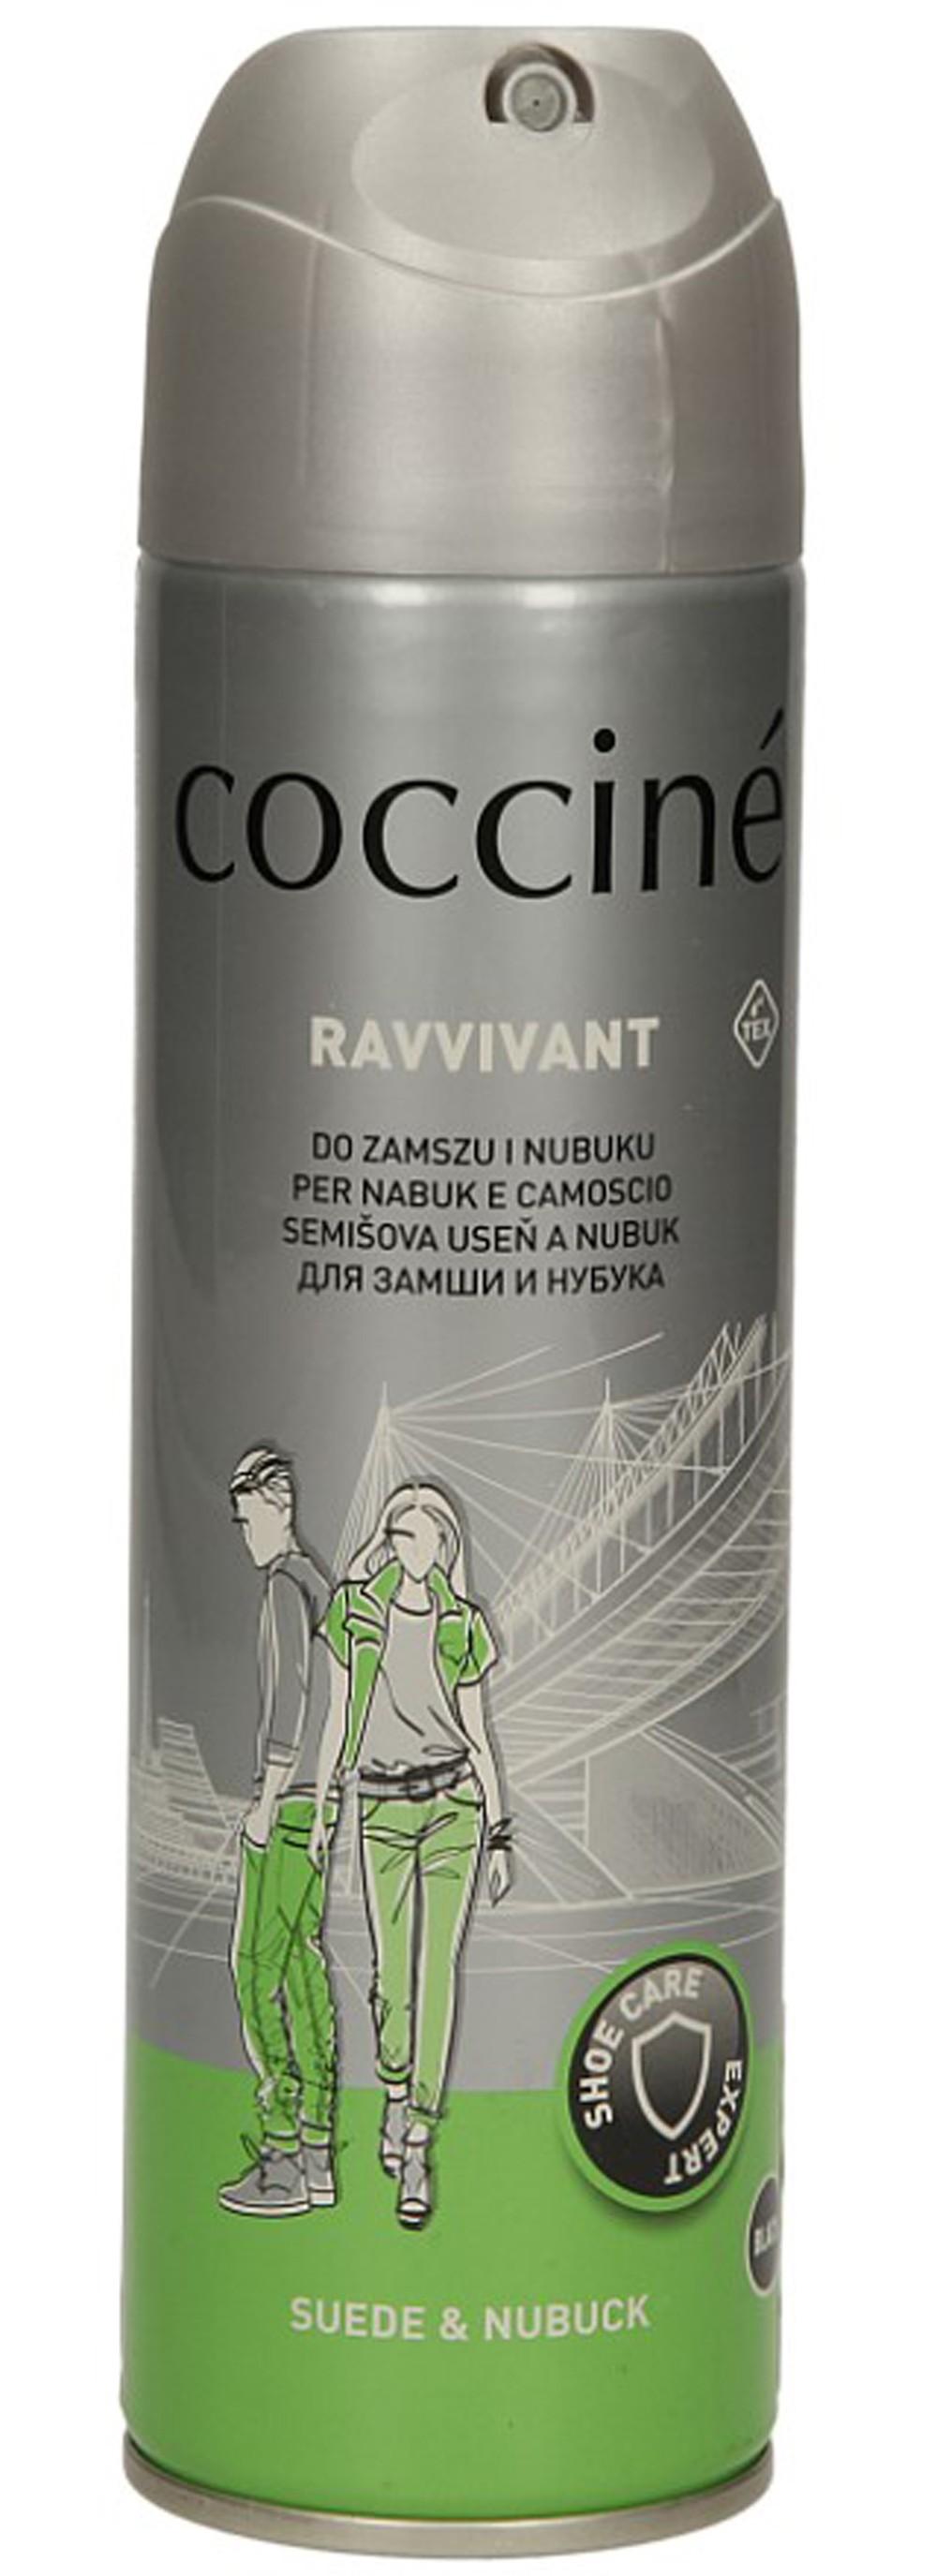 COCCINE RAVVIVANT SPRAY CZARNY 250ML producent Coccine